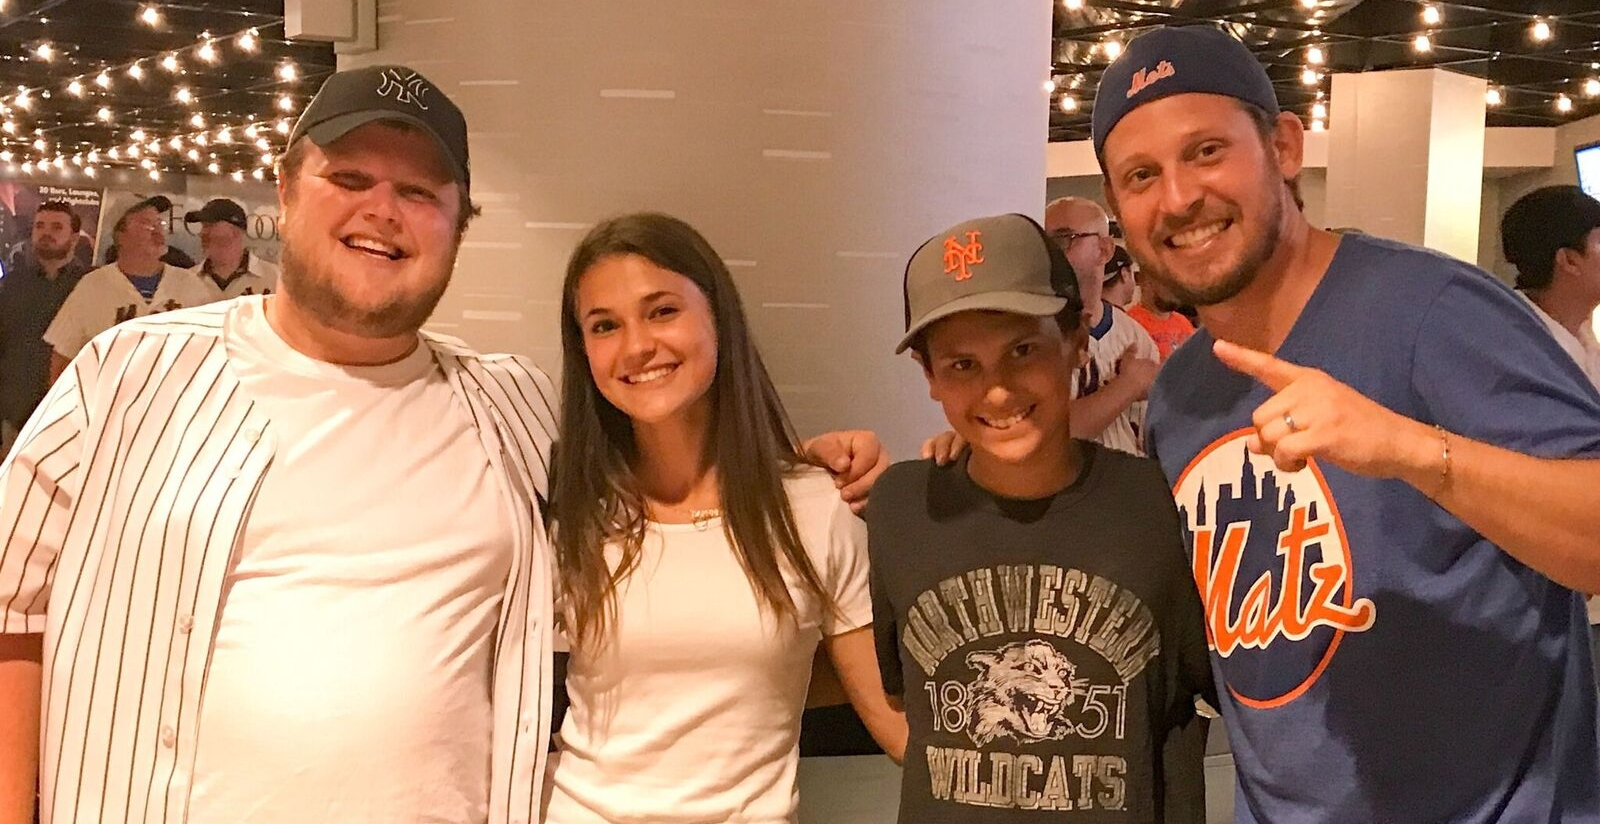 Chase, Daphne, Ellis, and Cory